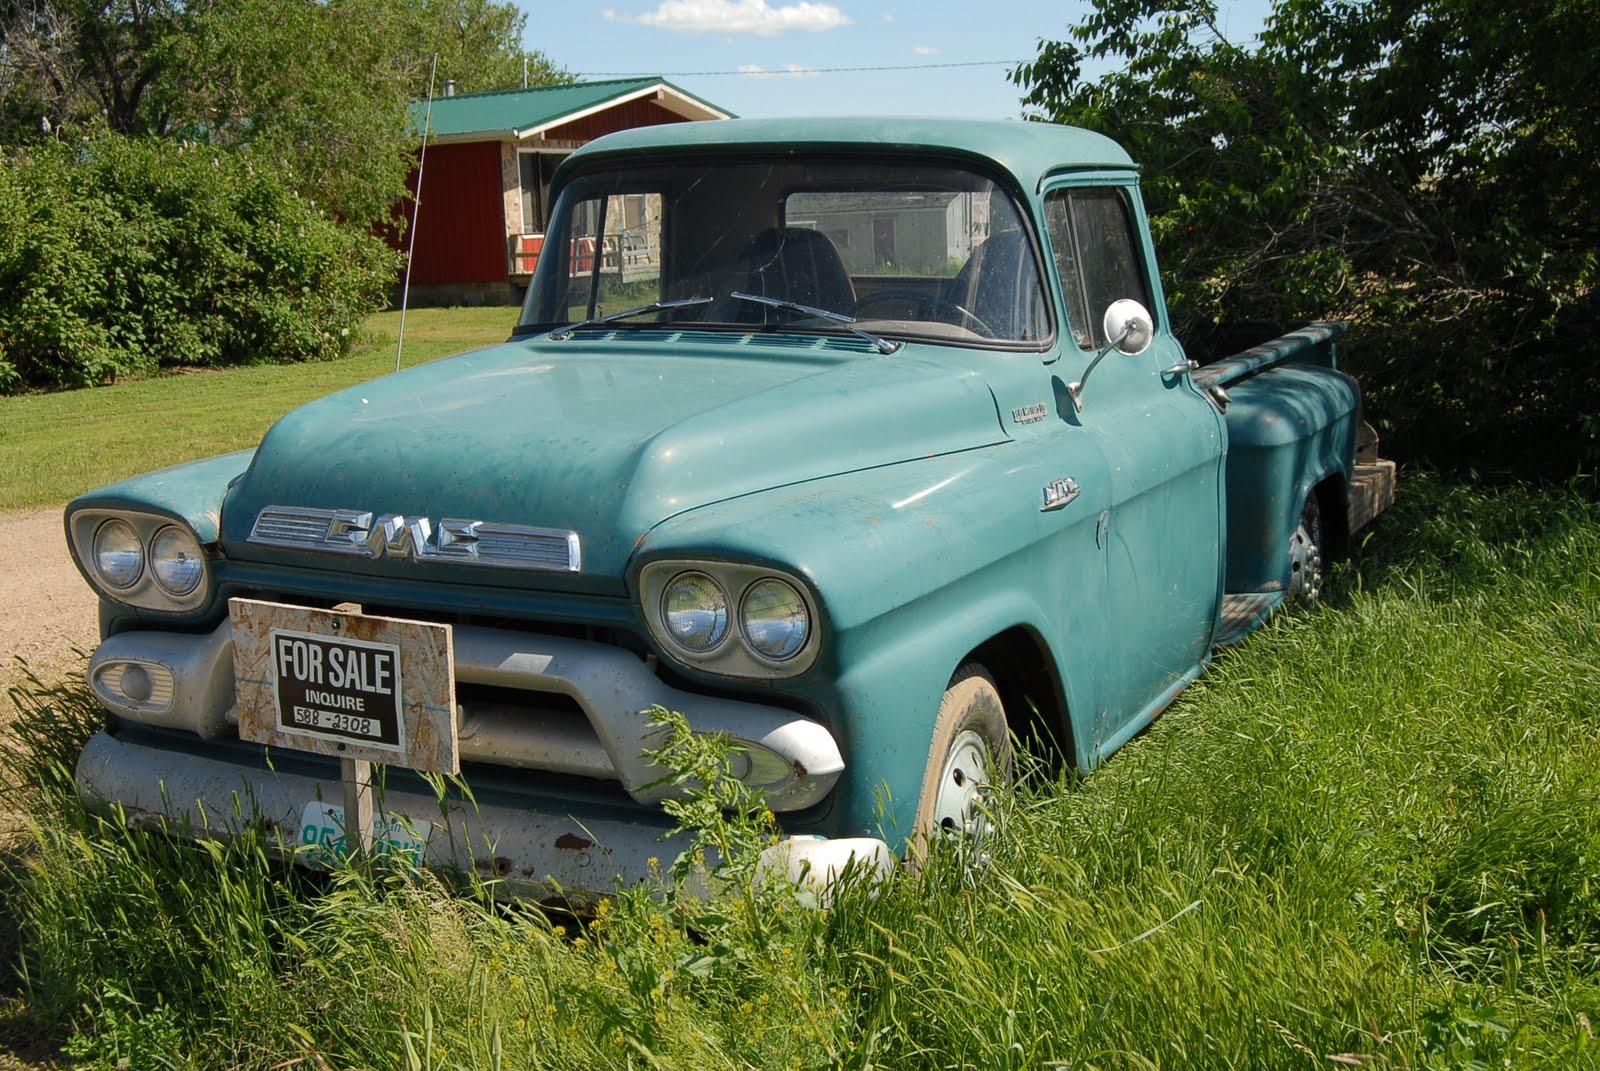 autoliterate: 2 Saskatchewan Chevrolets and the Maine Dodge